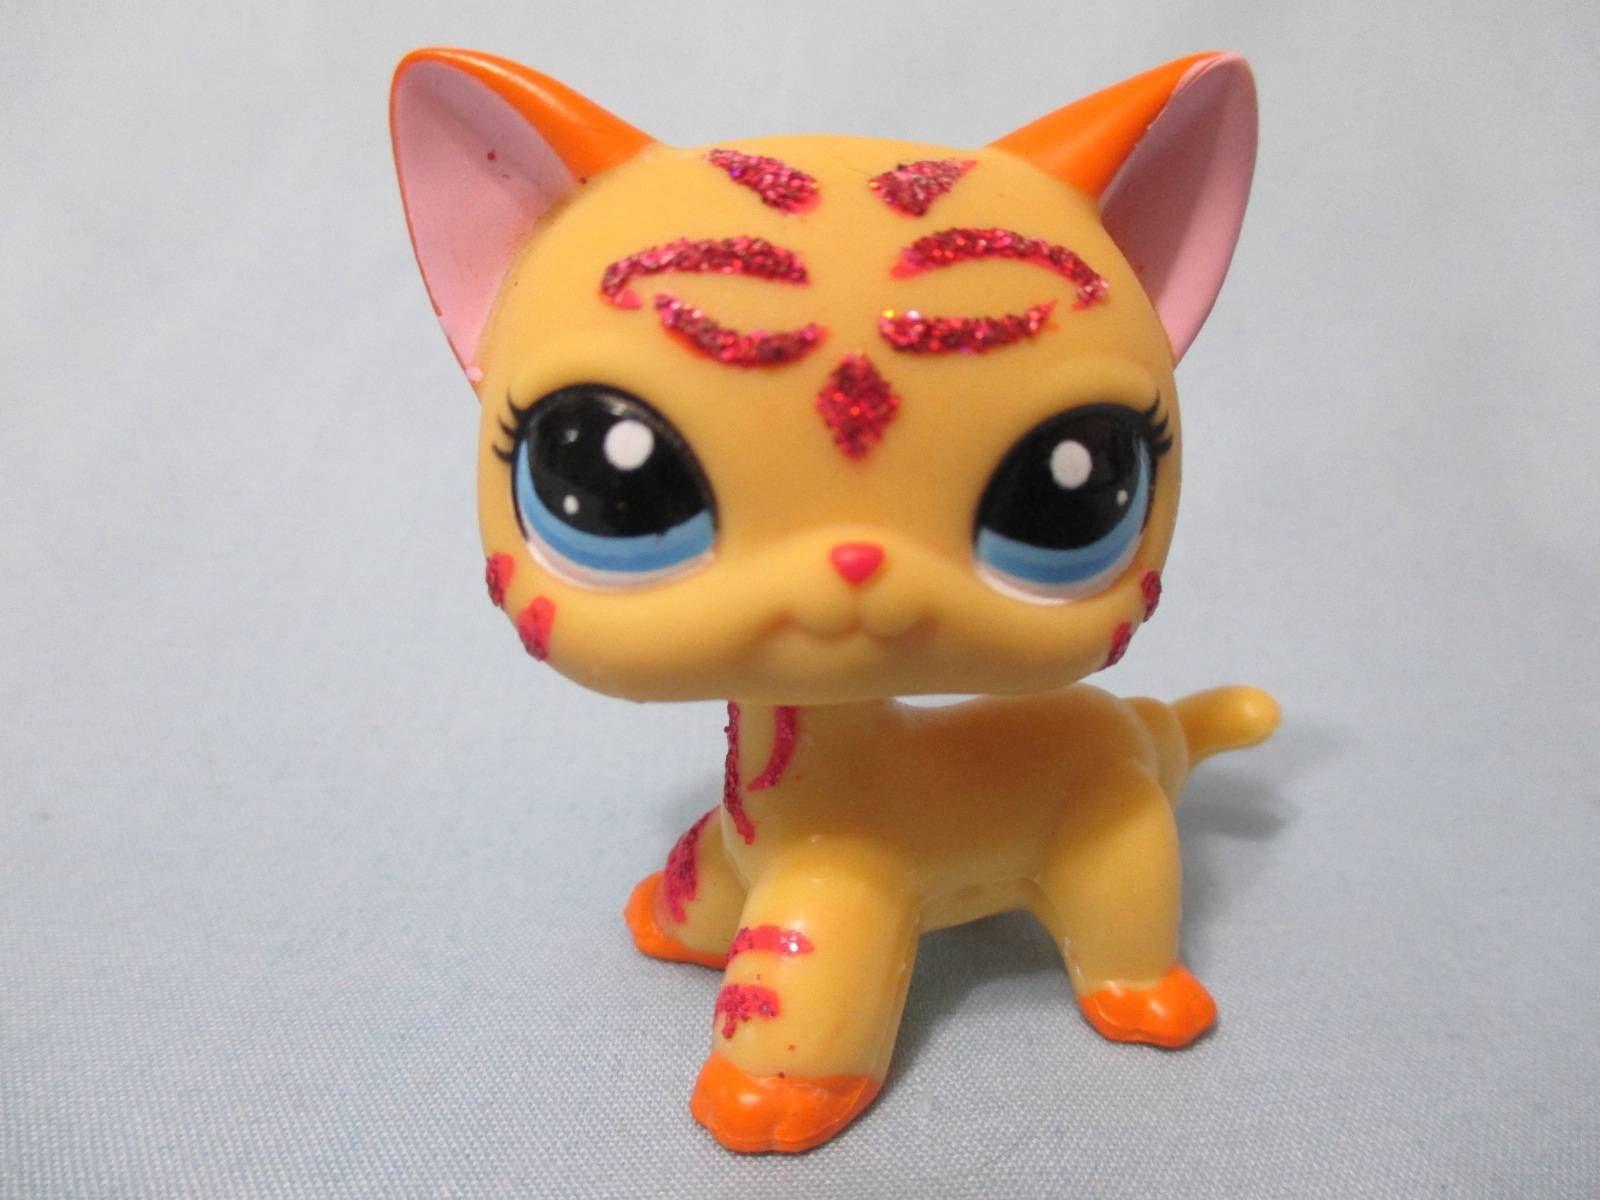 Littlest Pet Shop Lps Rare Orange Shorthair Pink Glitter Sparkle Cat